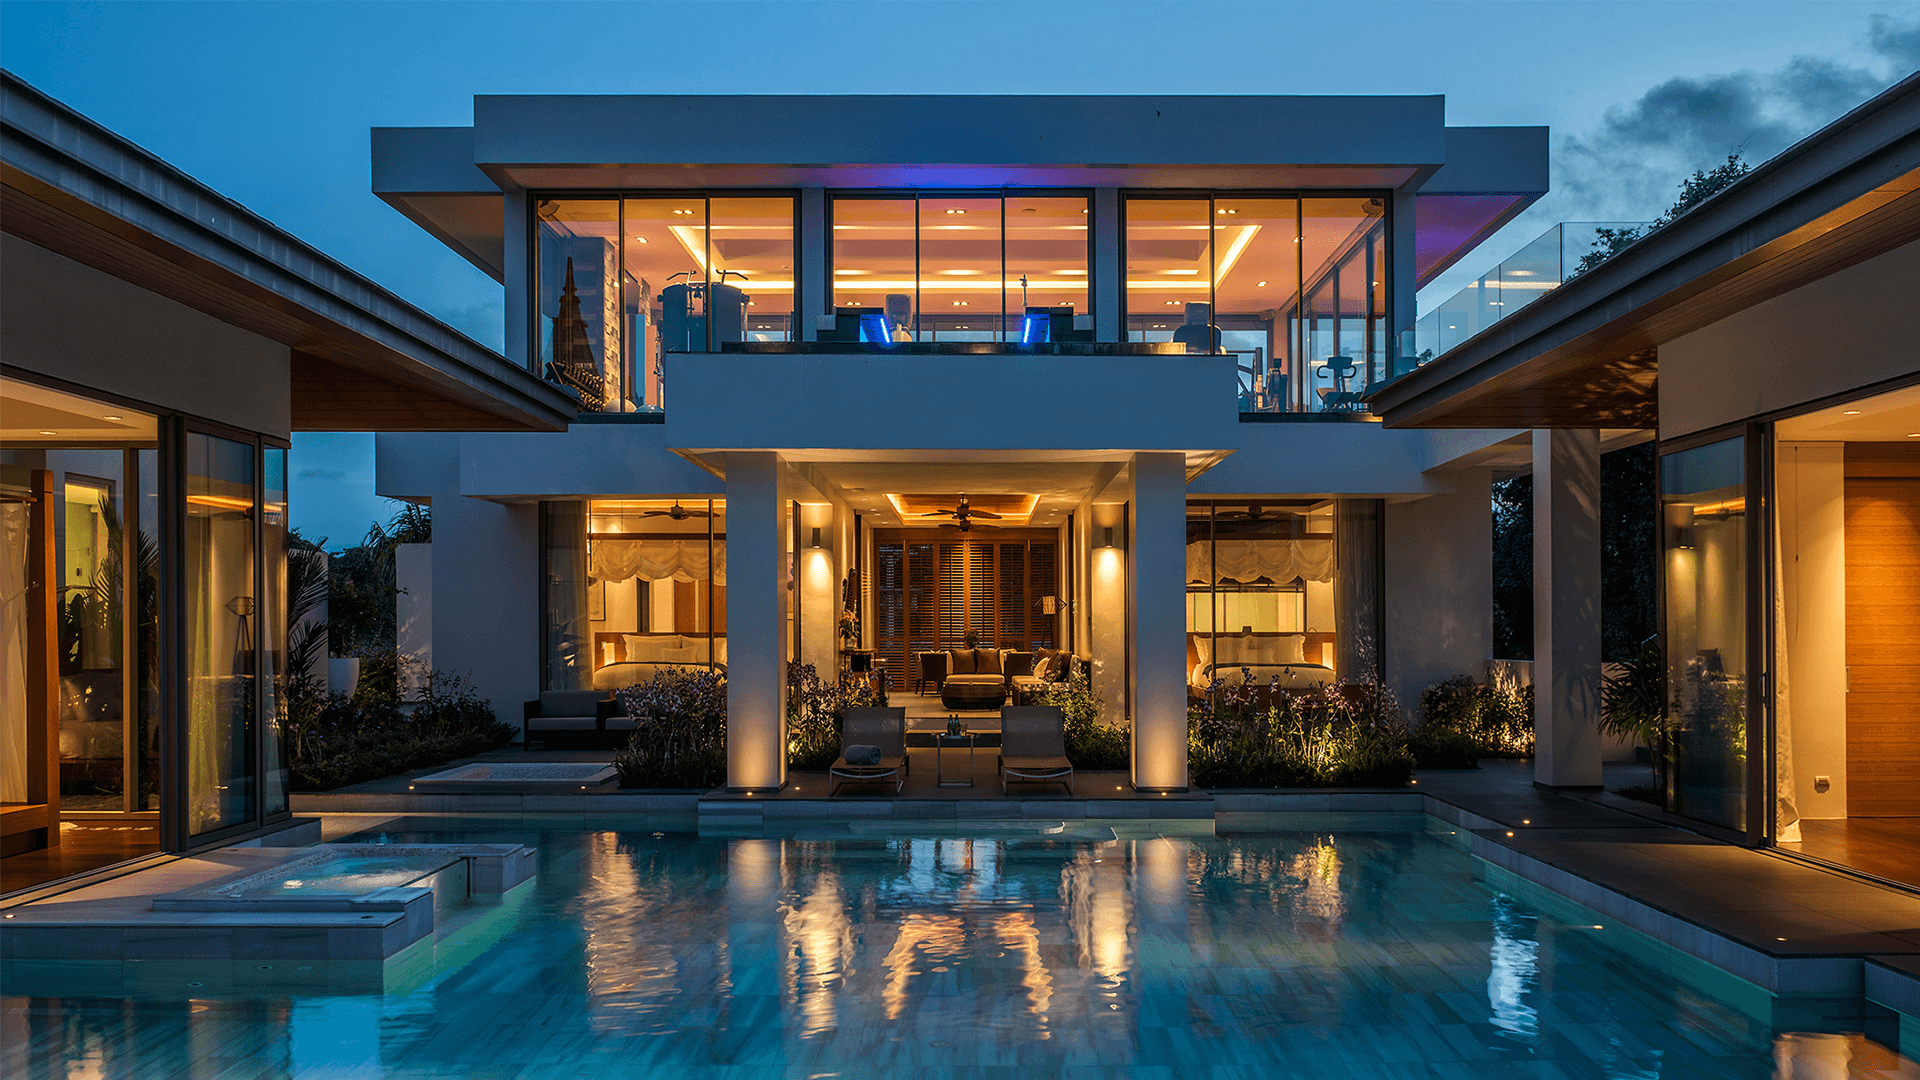 The Resort Villa : A Masterclass In Luxury